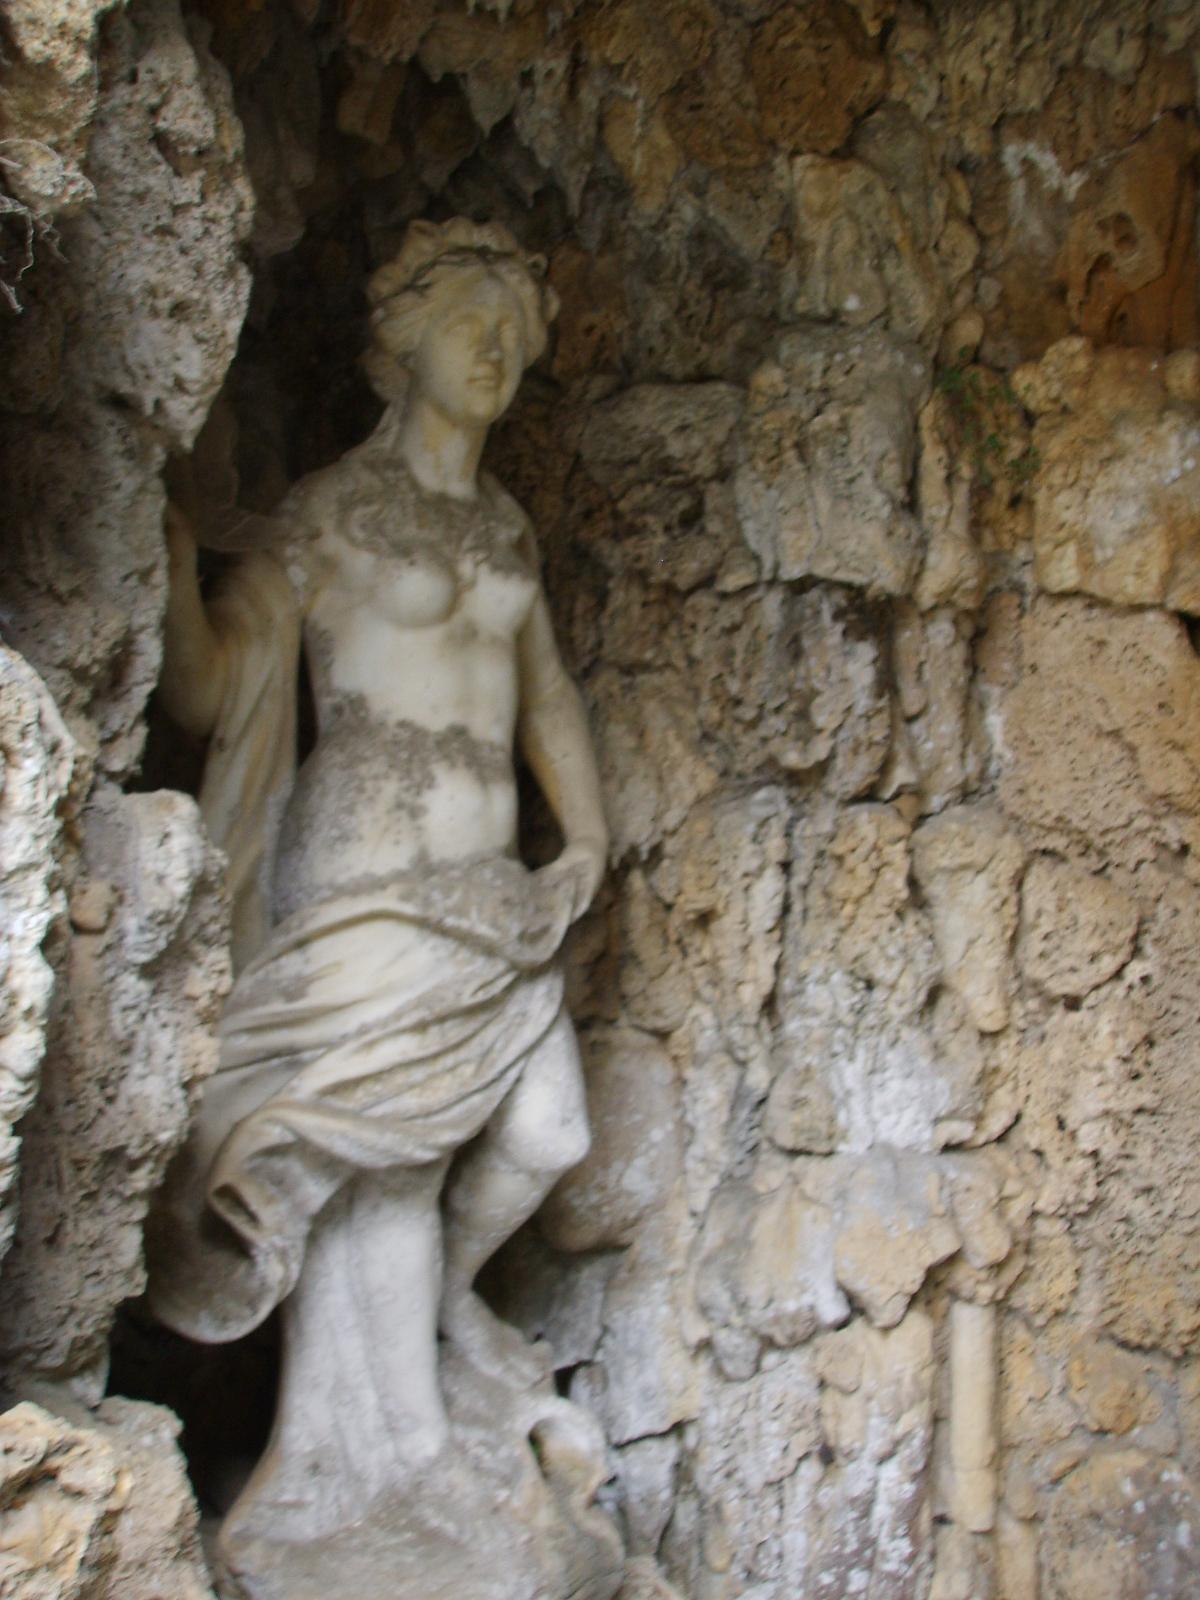 https://i0.wp.com/upload.wikimedia.org/wikipedia/commons/c/c1/Villa_torrigiani_di_lucca%2C_statua_04.JPG